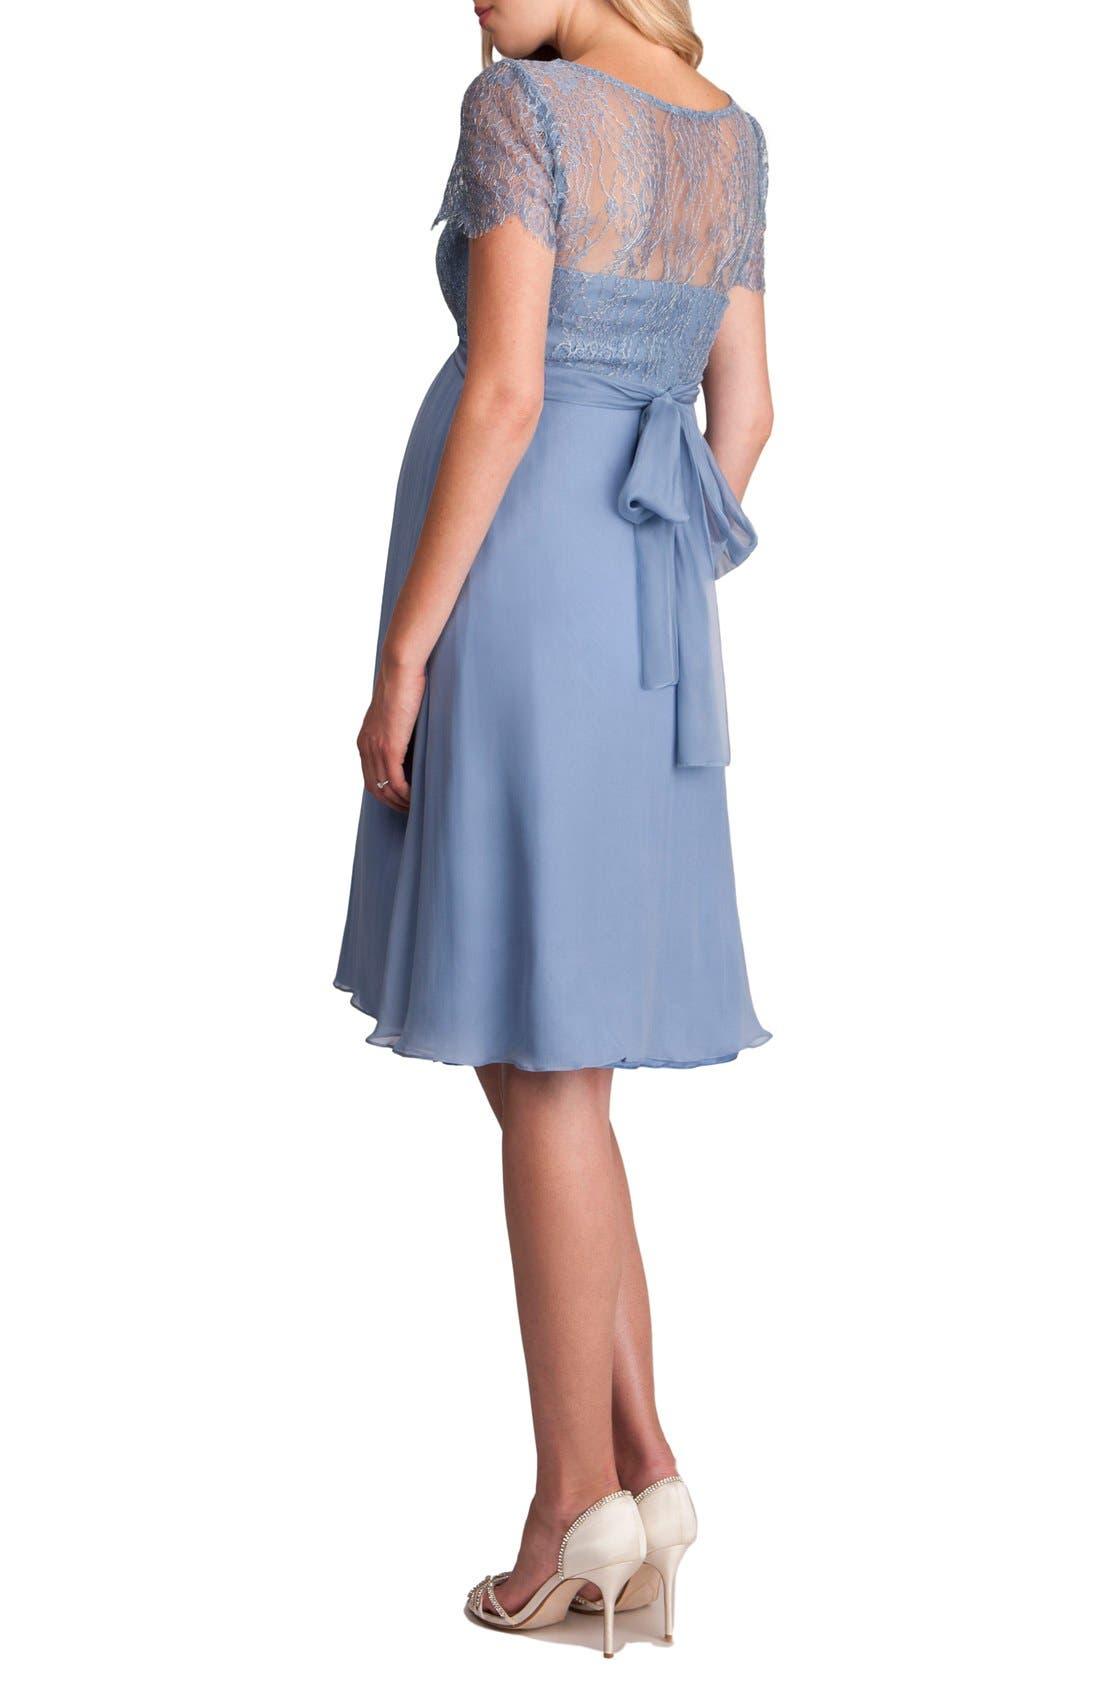 'Genevieve Luxe' Sleeveless Lace & Silk Maternity Dress,                             Alternate thumbnail 2, color,                             Paleblue